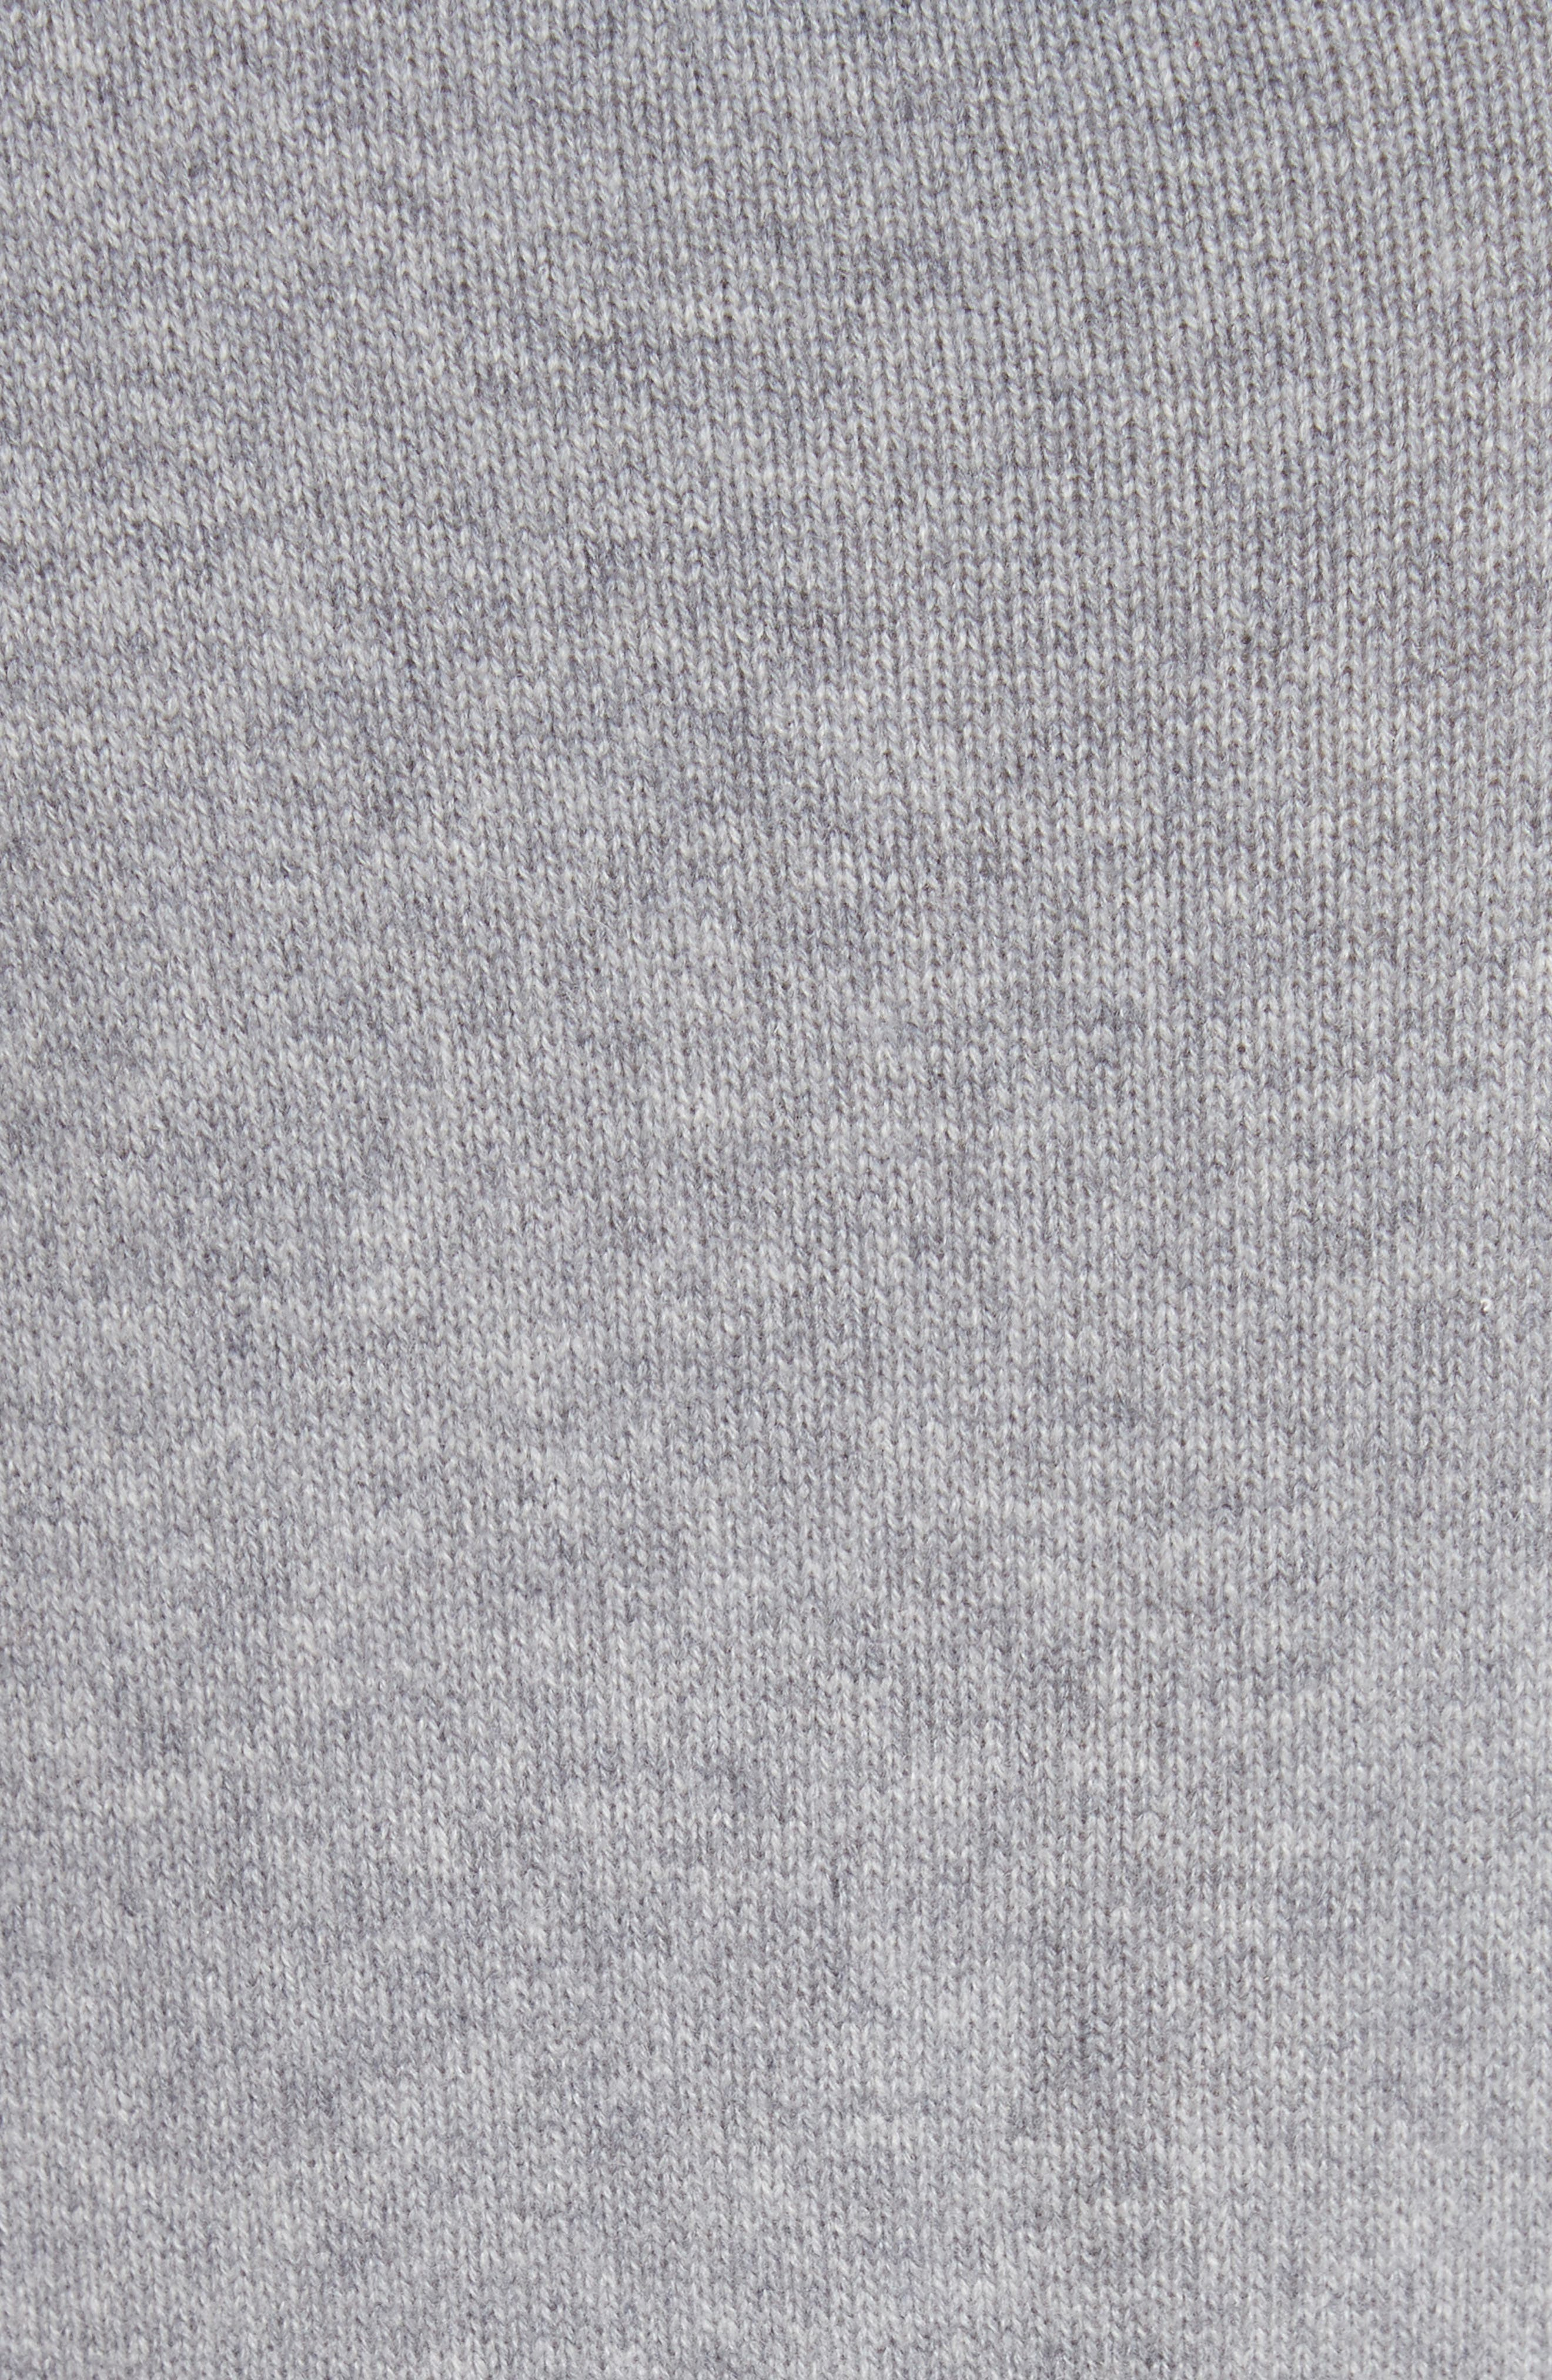 Tie Detail Cashmere Sweater,                             Alternate thumbnail 5, color,